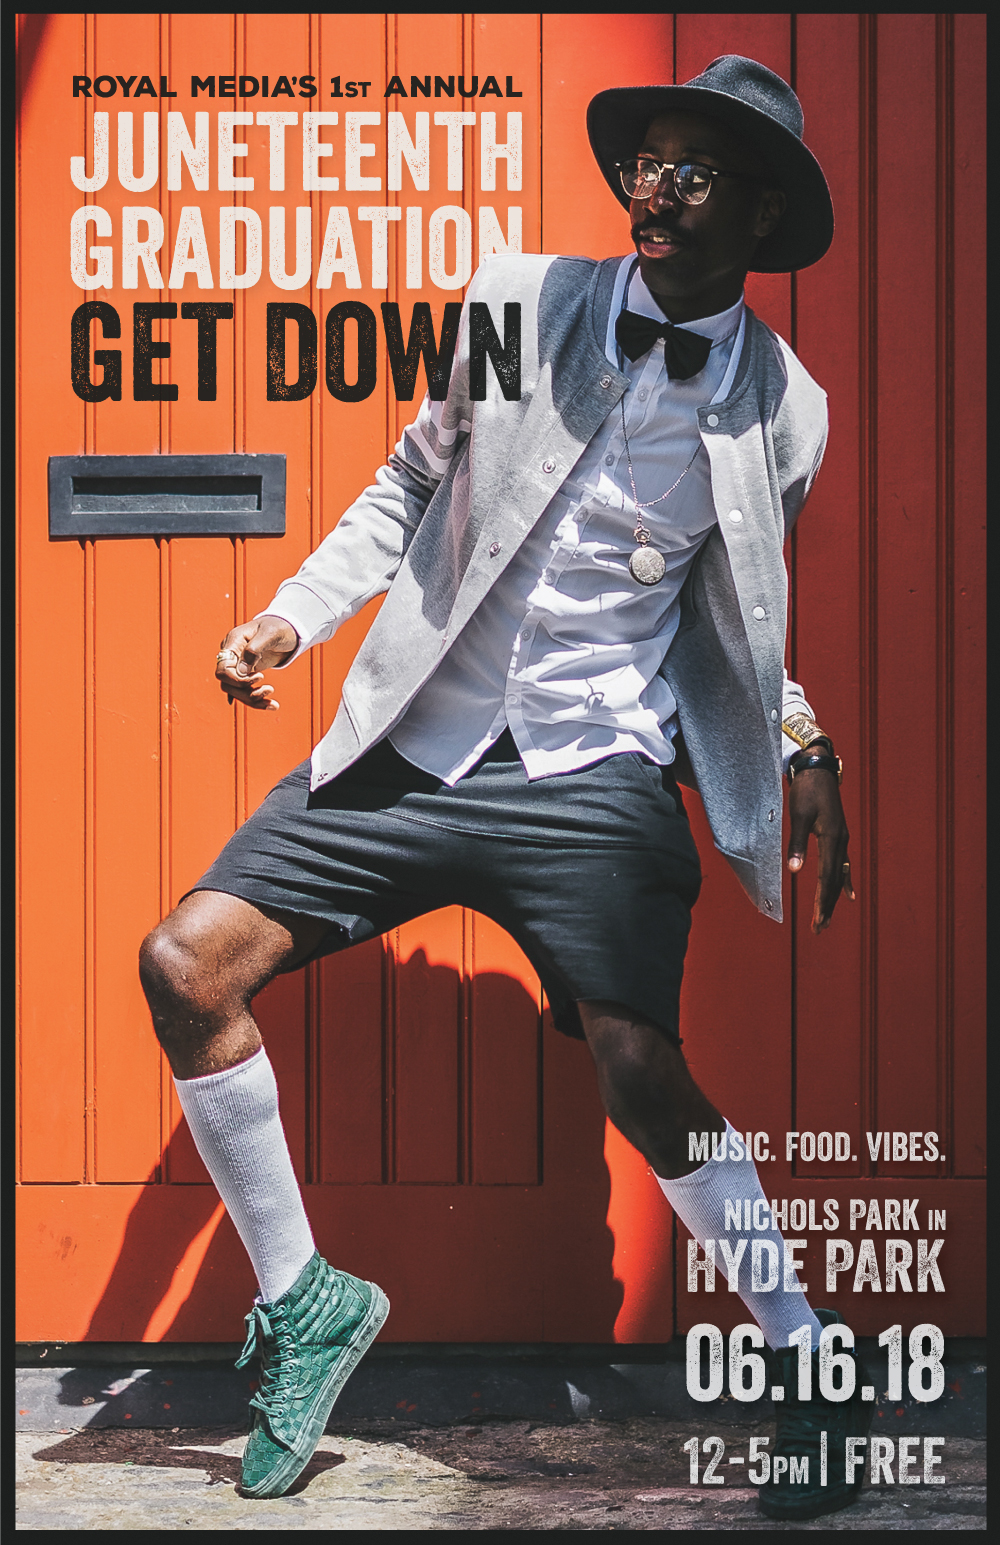 Get-Down-Flyer.jpg